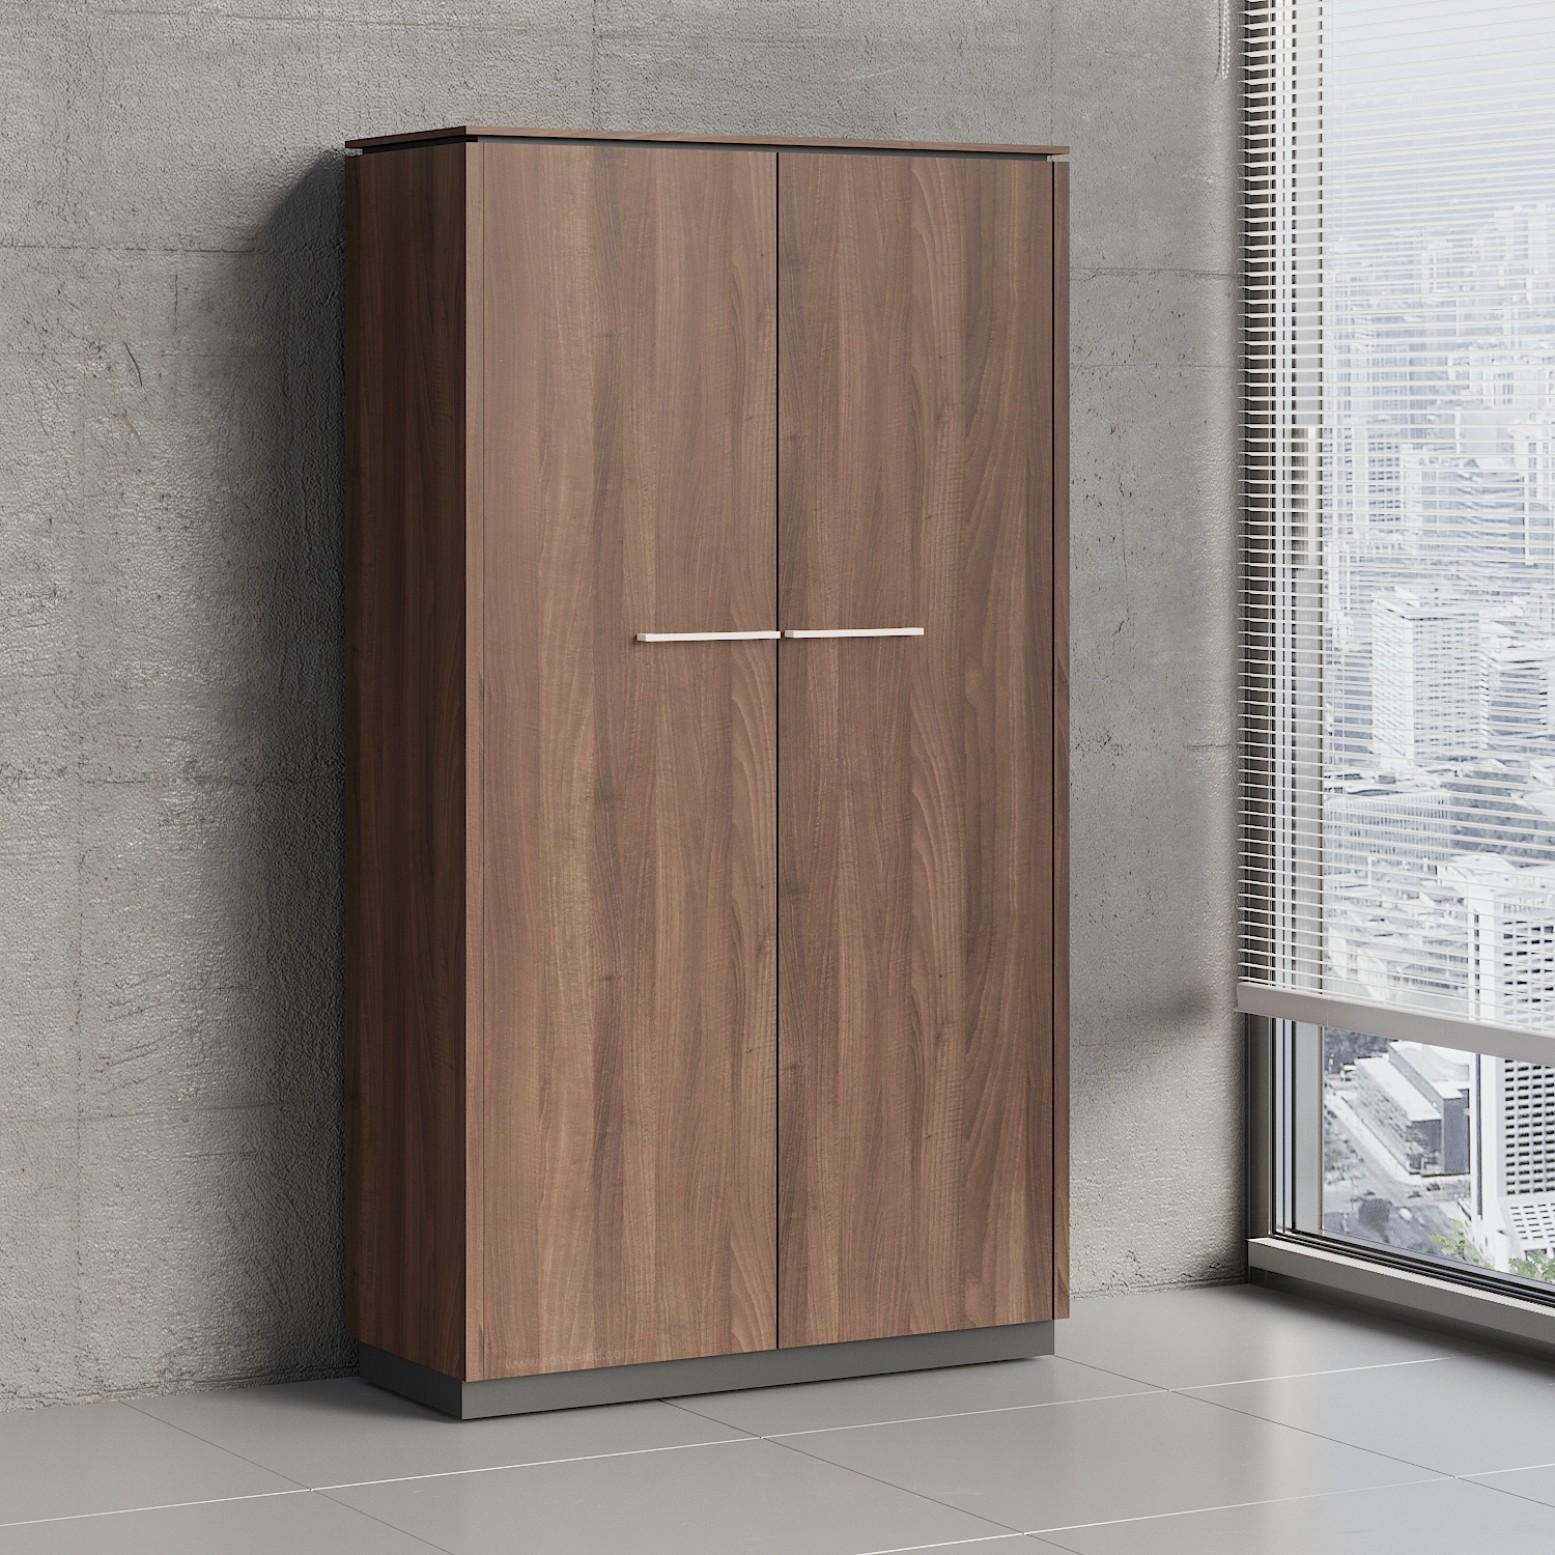 Status 2 Door Wardrobe Storage Cabinet